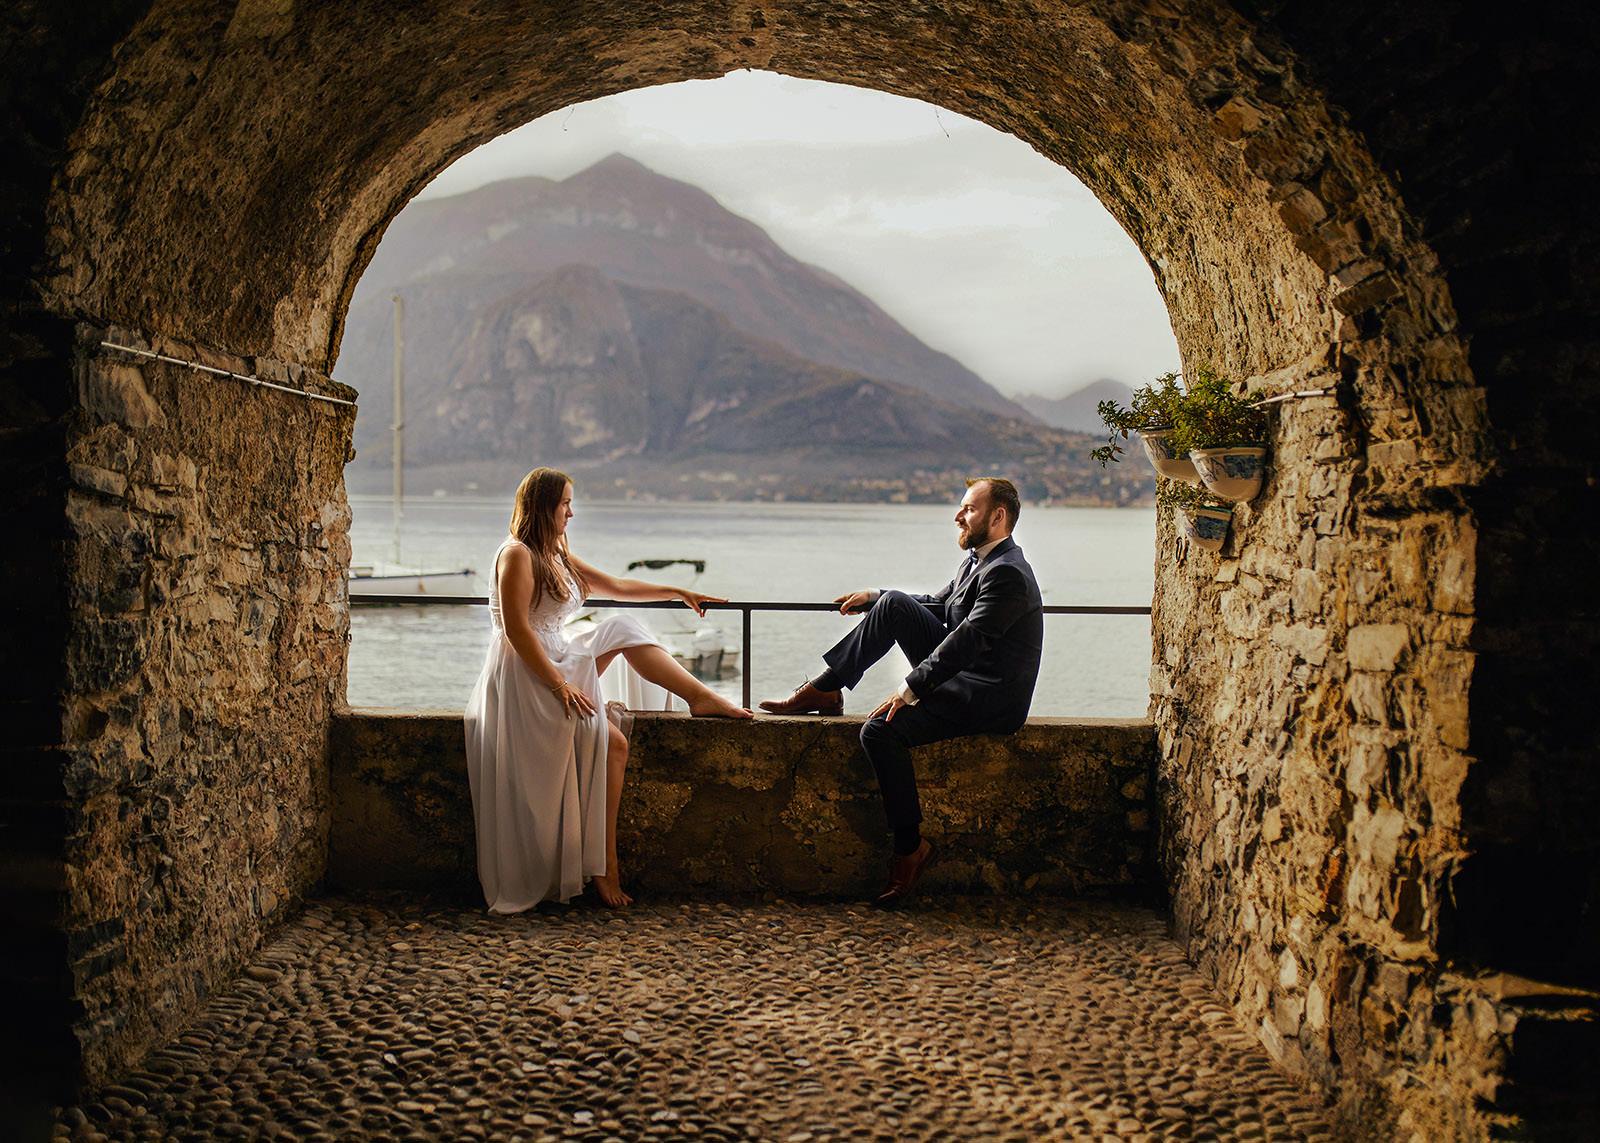 Asia i Michał sesja nad jeziorem Como